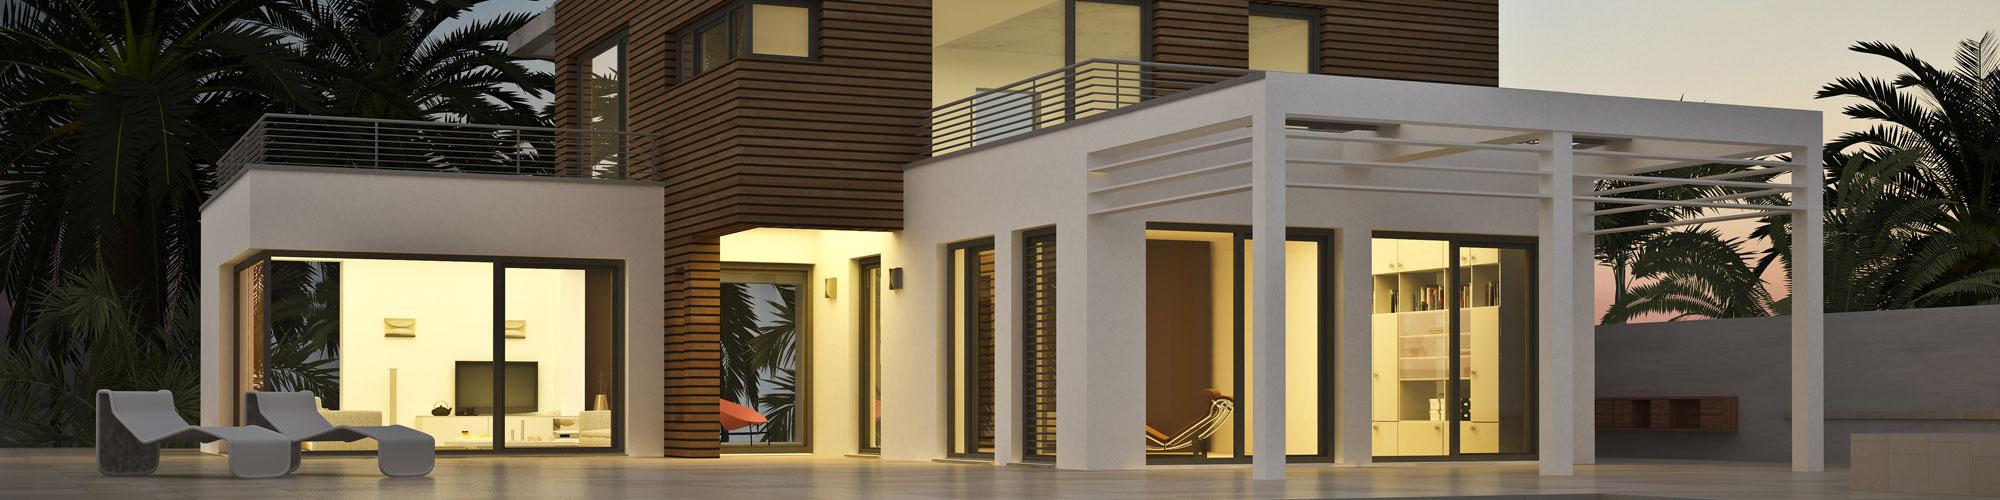 Villa am Abend - Elektro Boll Solar GmbH - Lauchringen